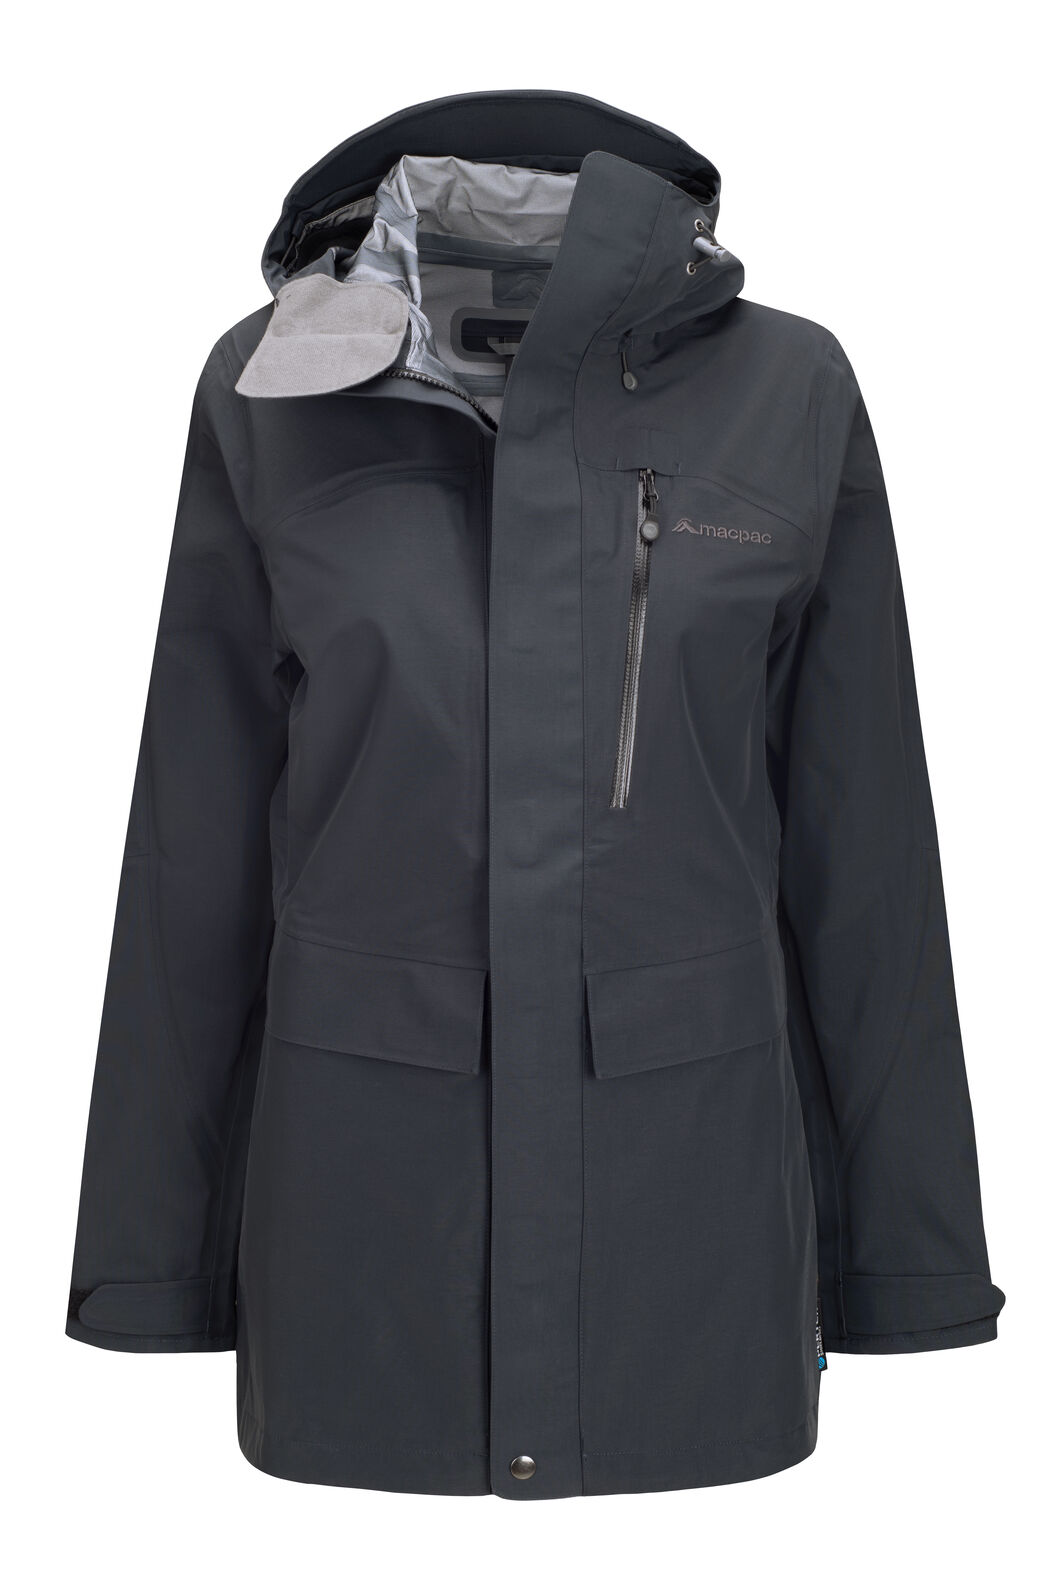 Macpac Women's Resolution Pertex® Rain Jacket, Black, hi-res